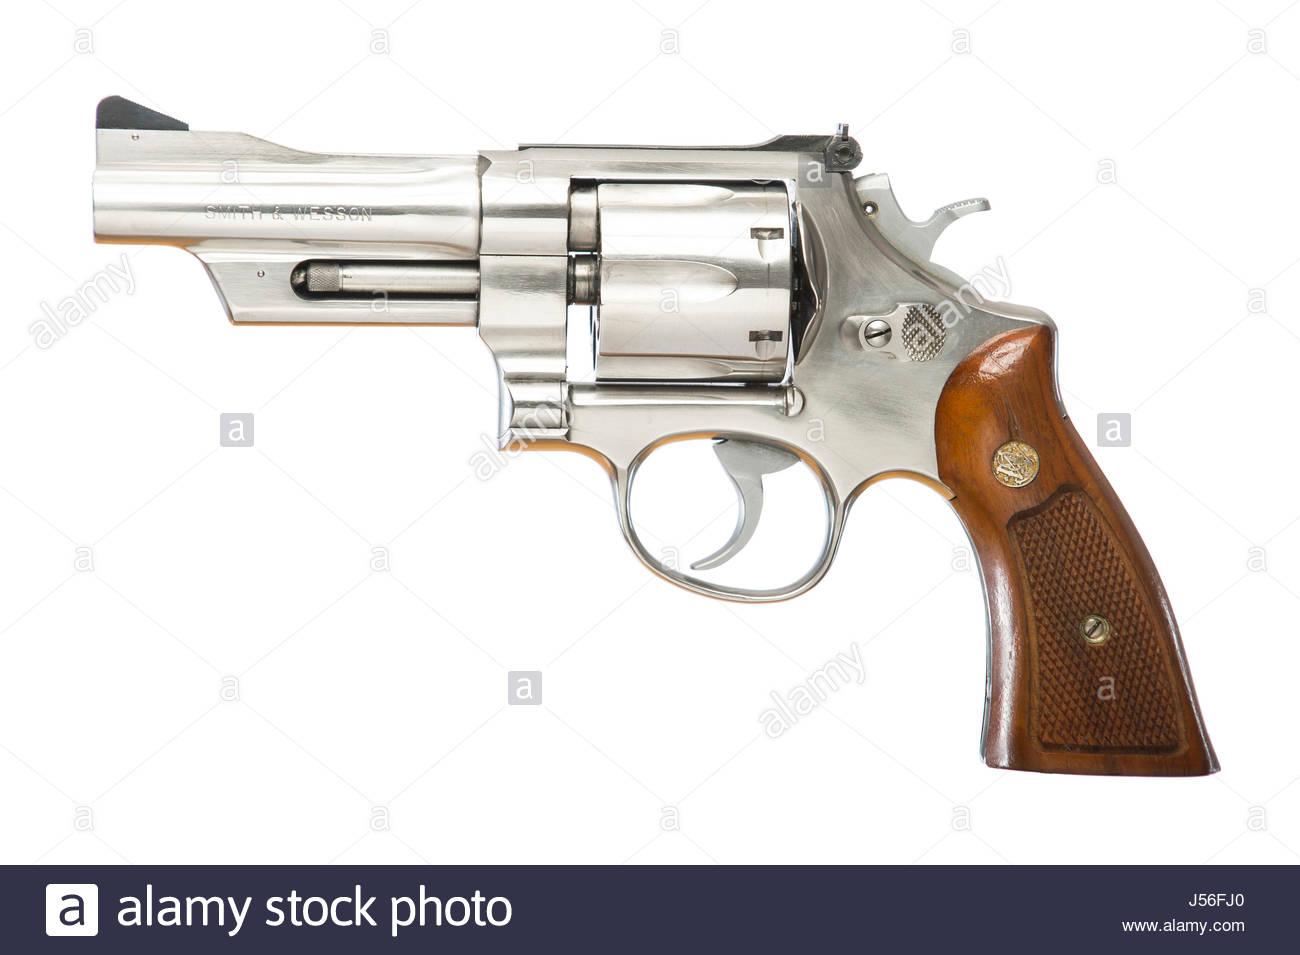 Smith & Wesson 44 special CTG, N frame 4 inch barrel revolver pistol ...